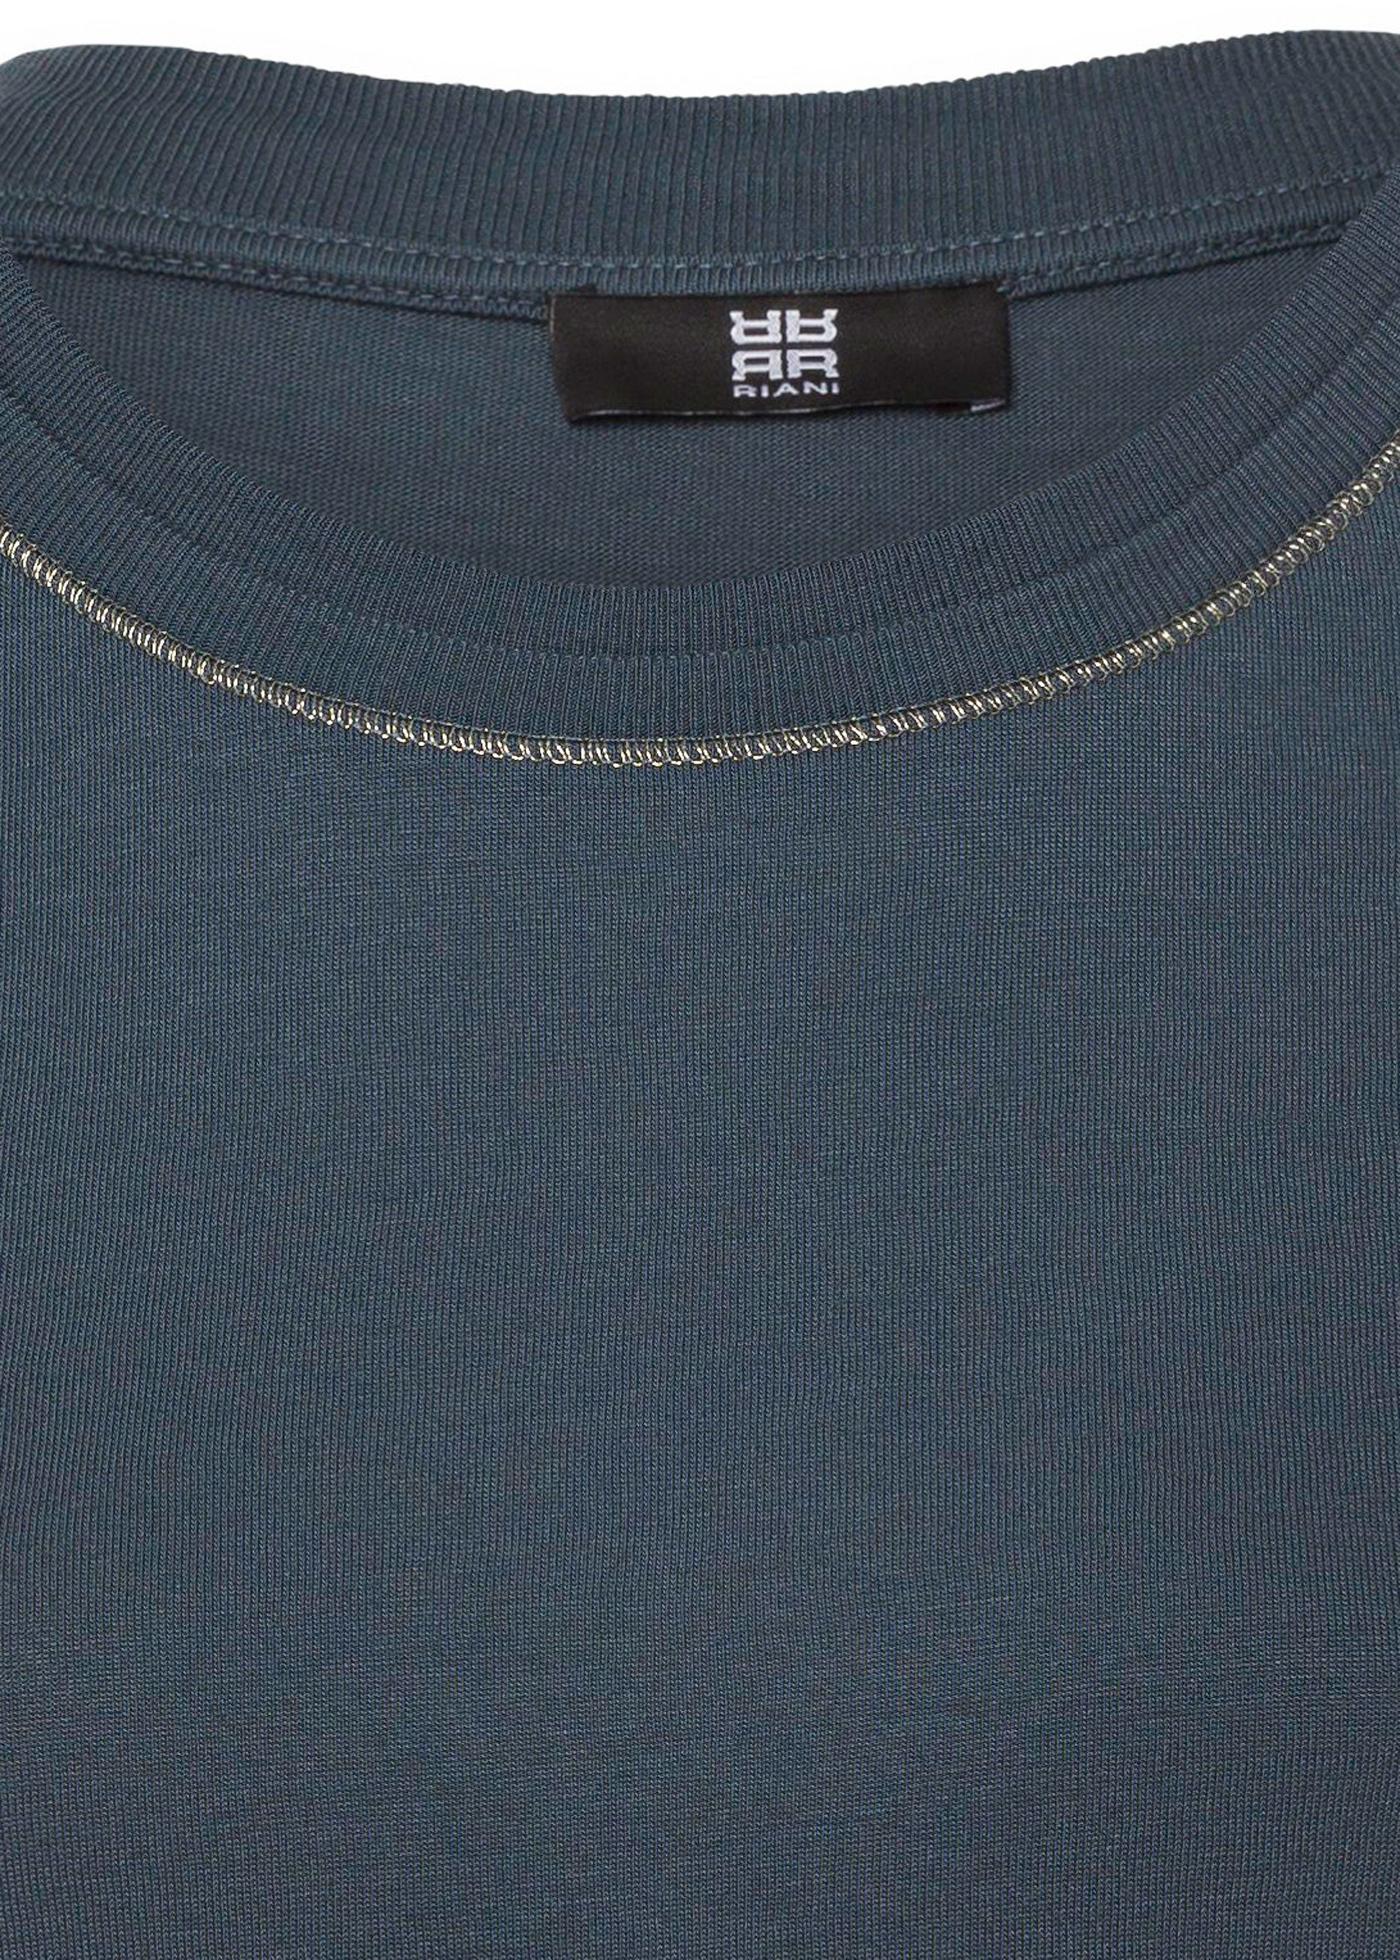 Shirt mit Arm image number 2